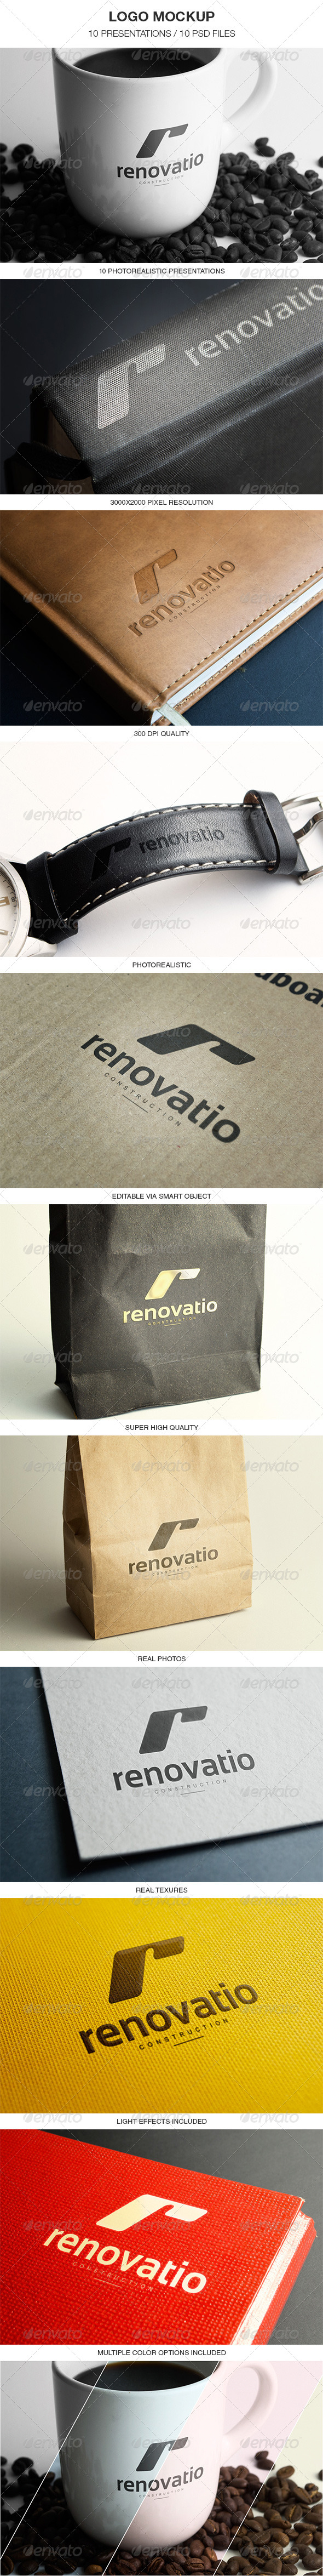 GraphicRiver 10 Photorealistic Logo Mockups 5099679